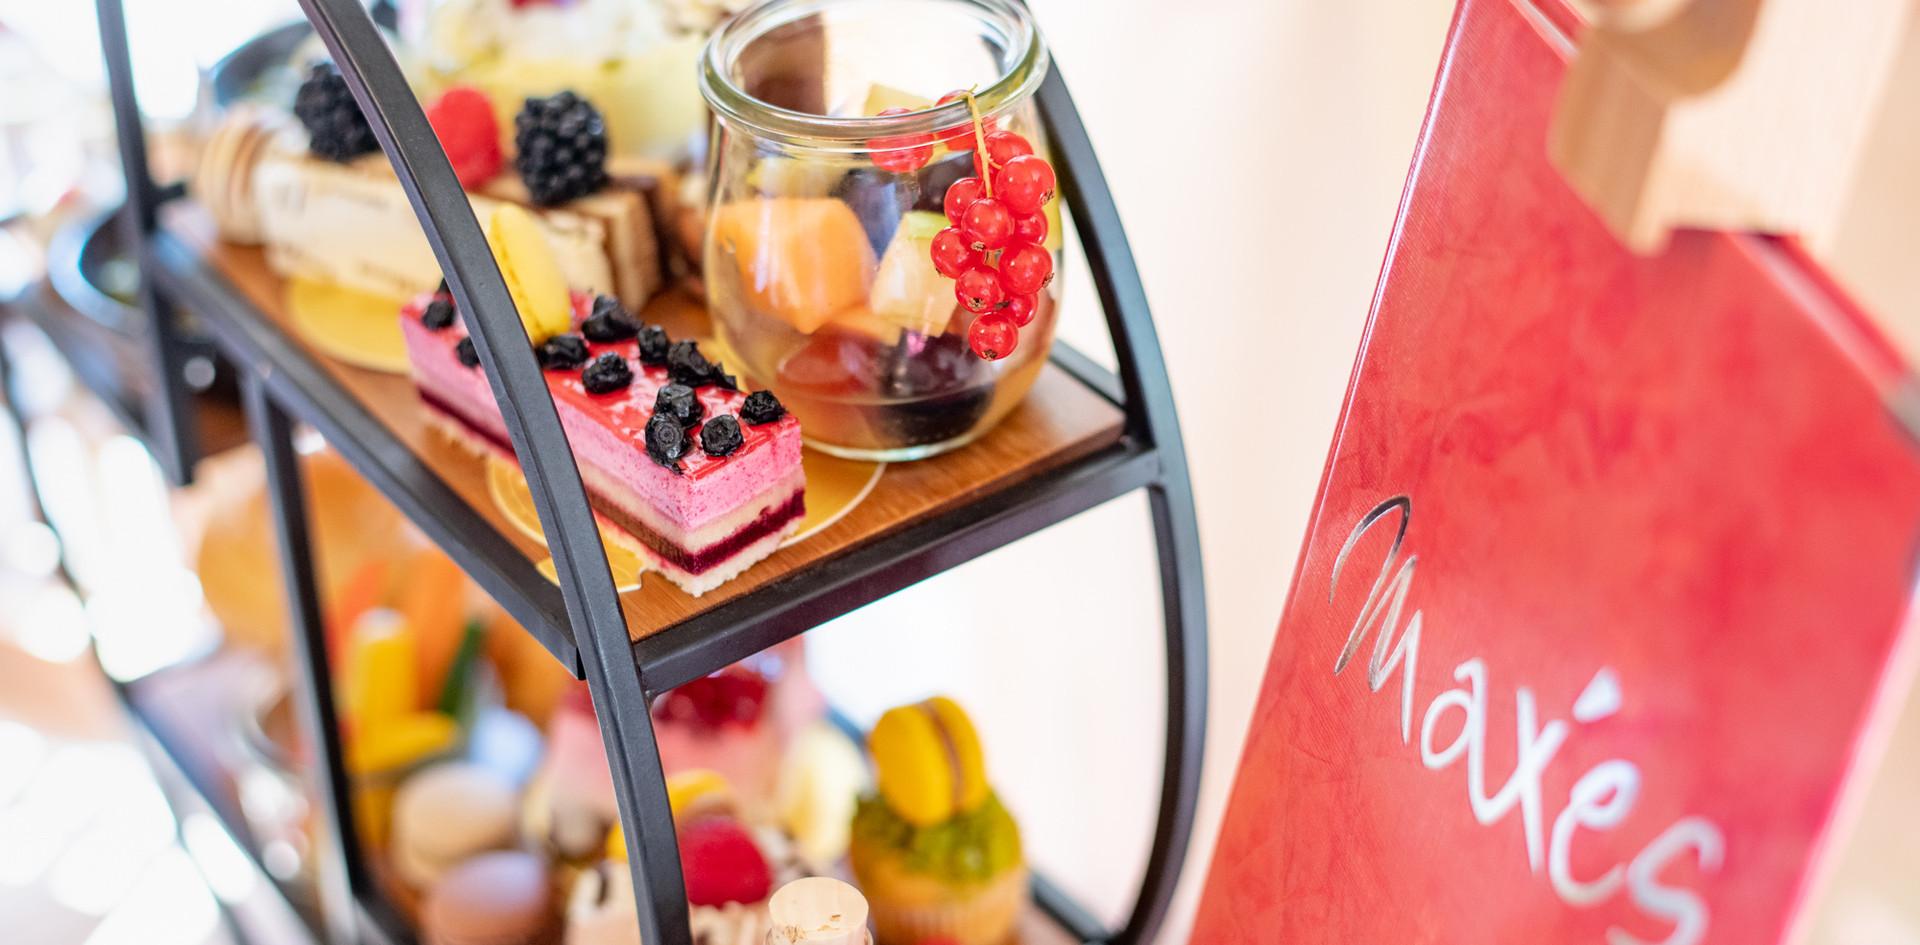 Etagere mit Teekarte Afternoon Tea - Hotel Wegner - The culinary Art Hotel